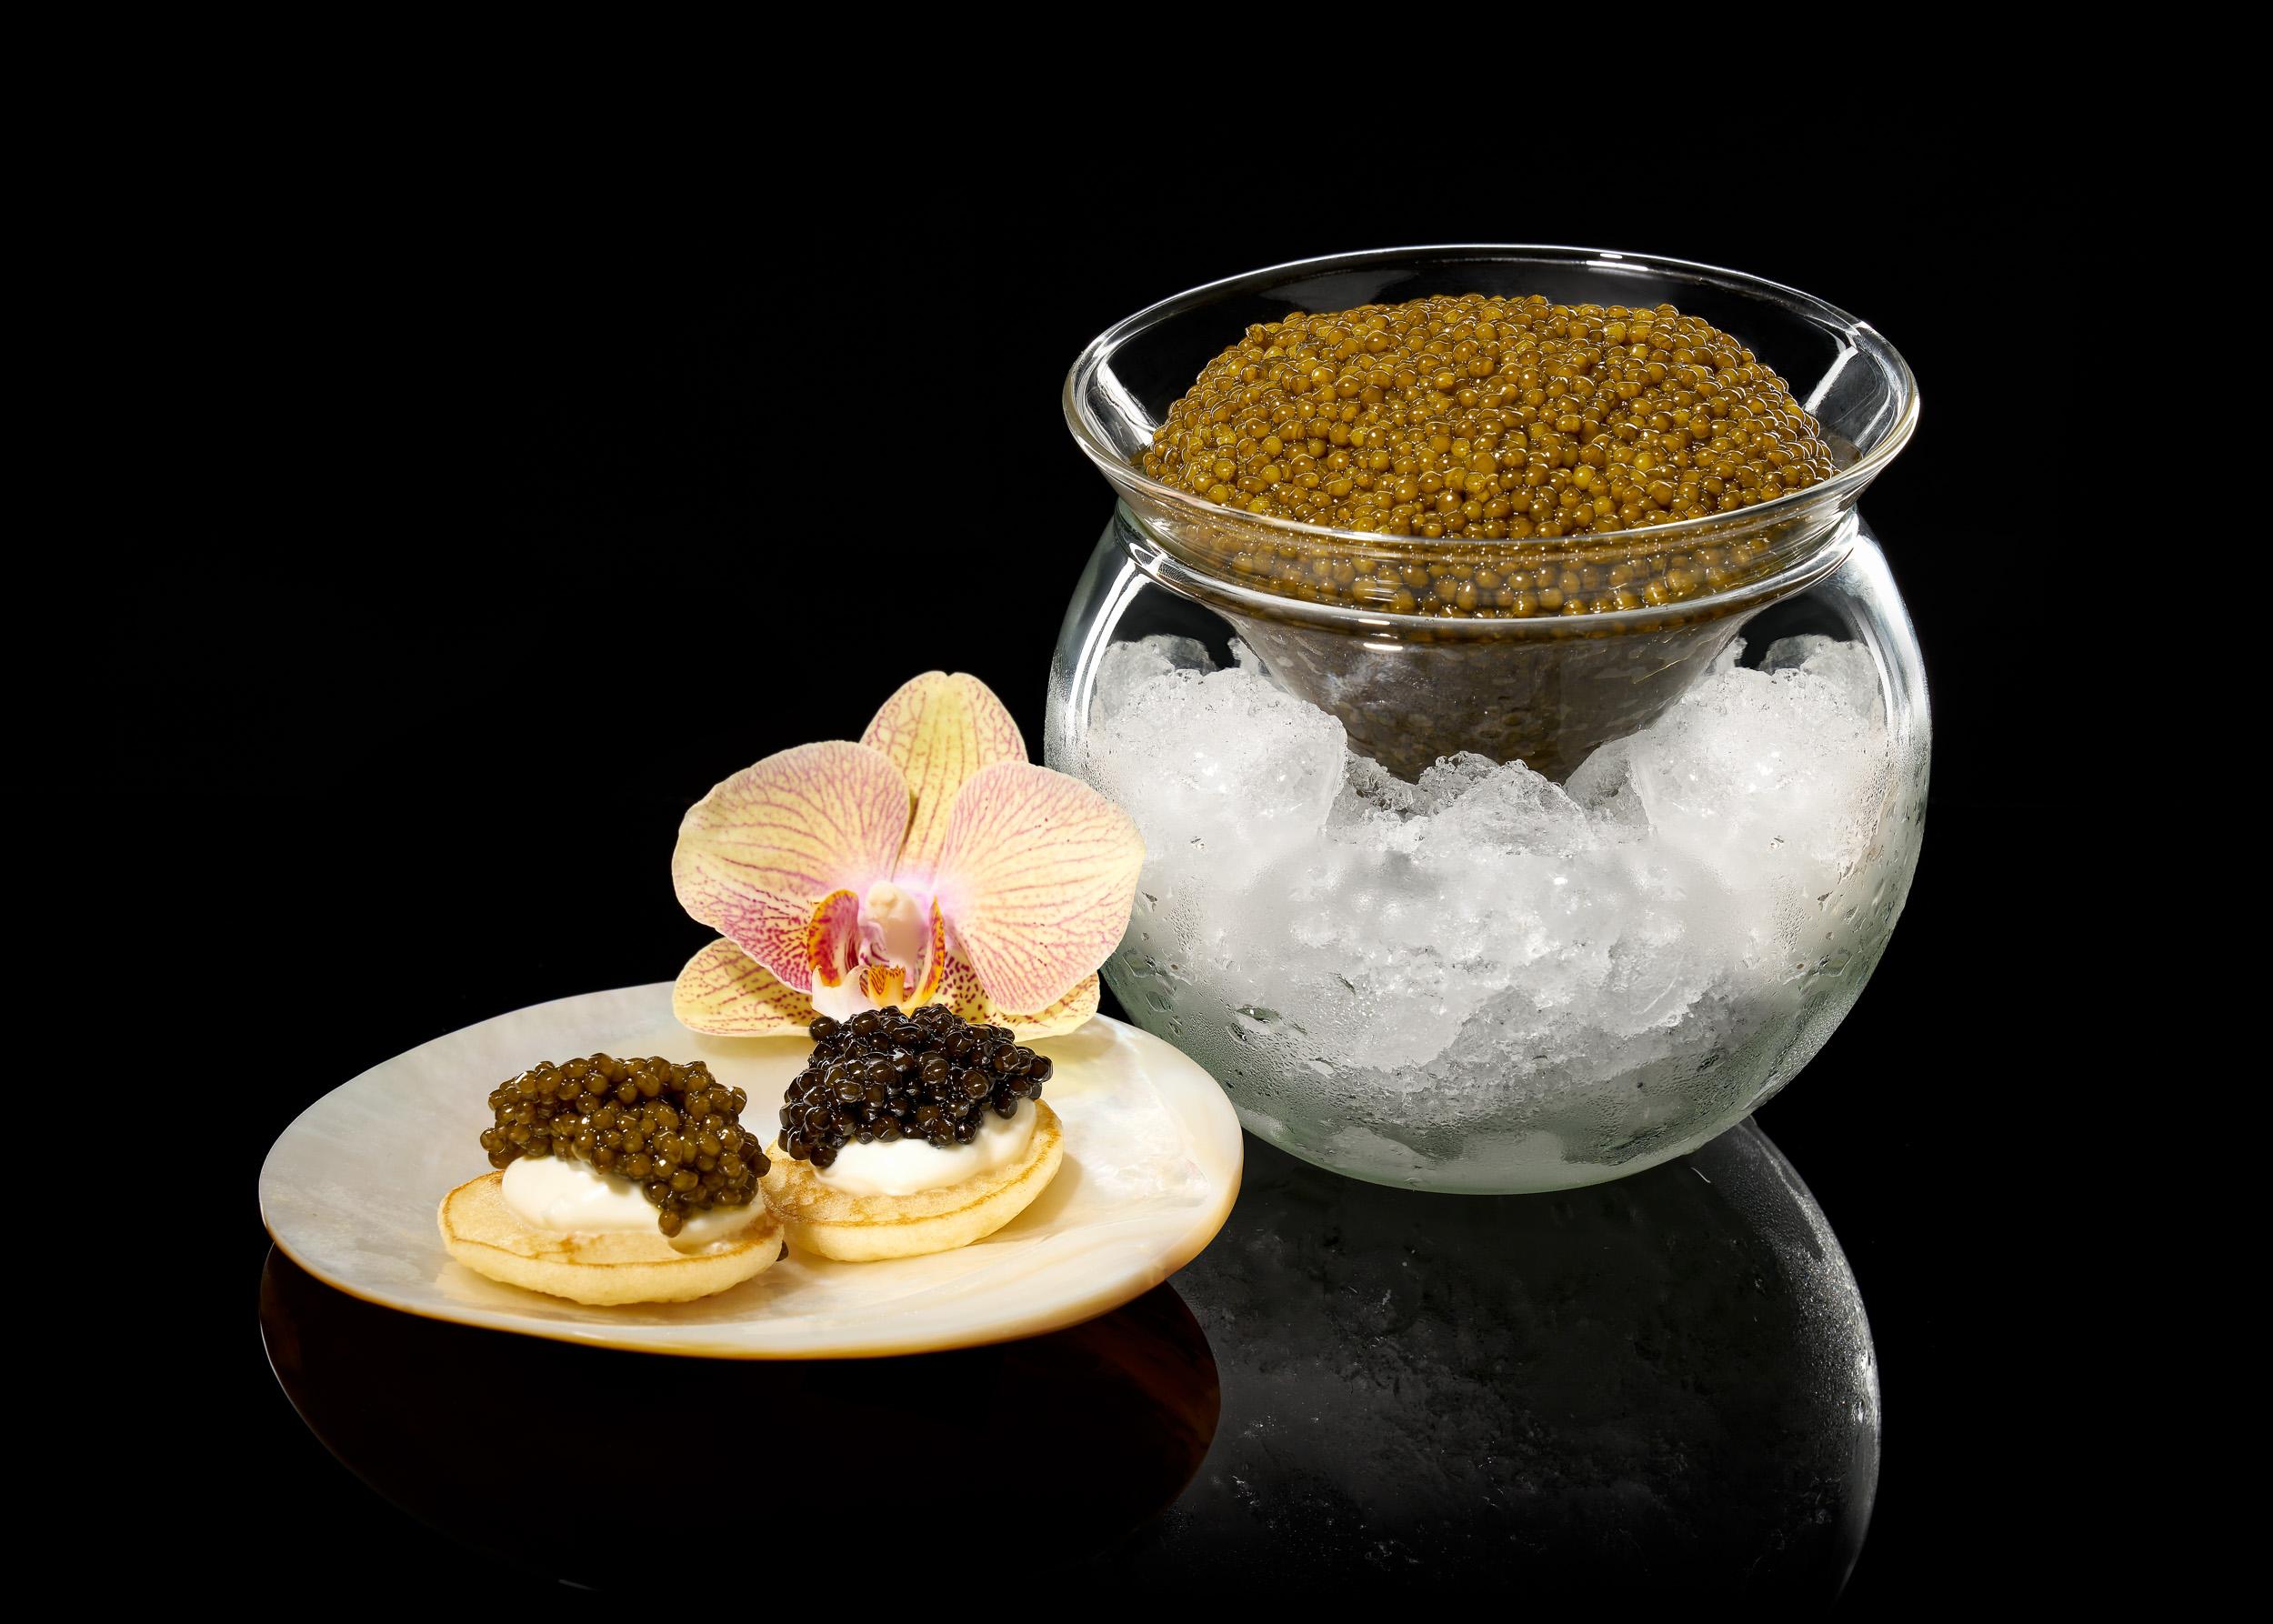 Miami_Fort_Lauderdale_food_photographer_Caviar_2-Edit.jpg